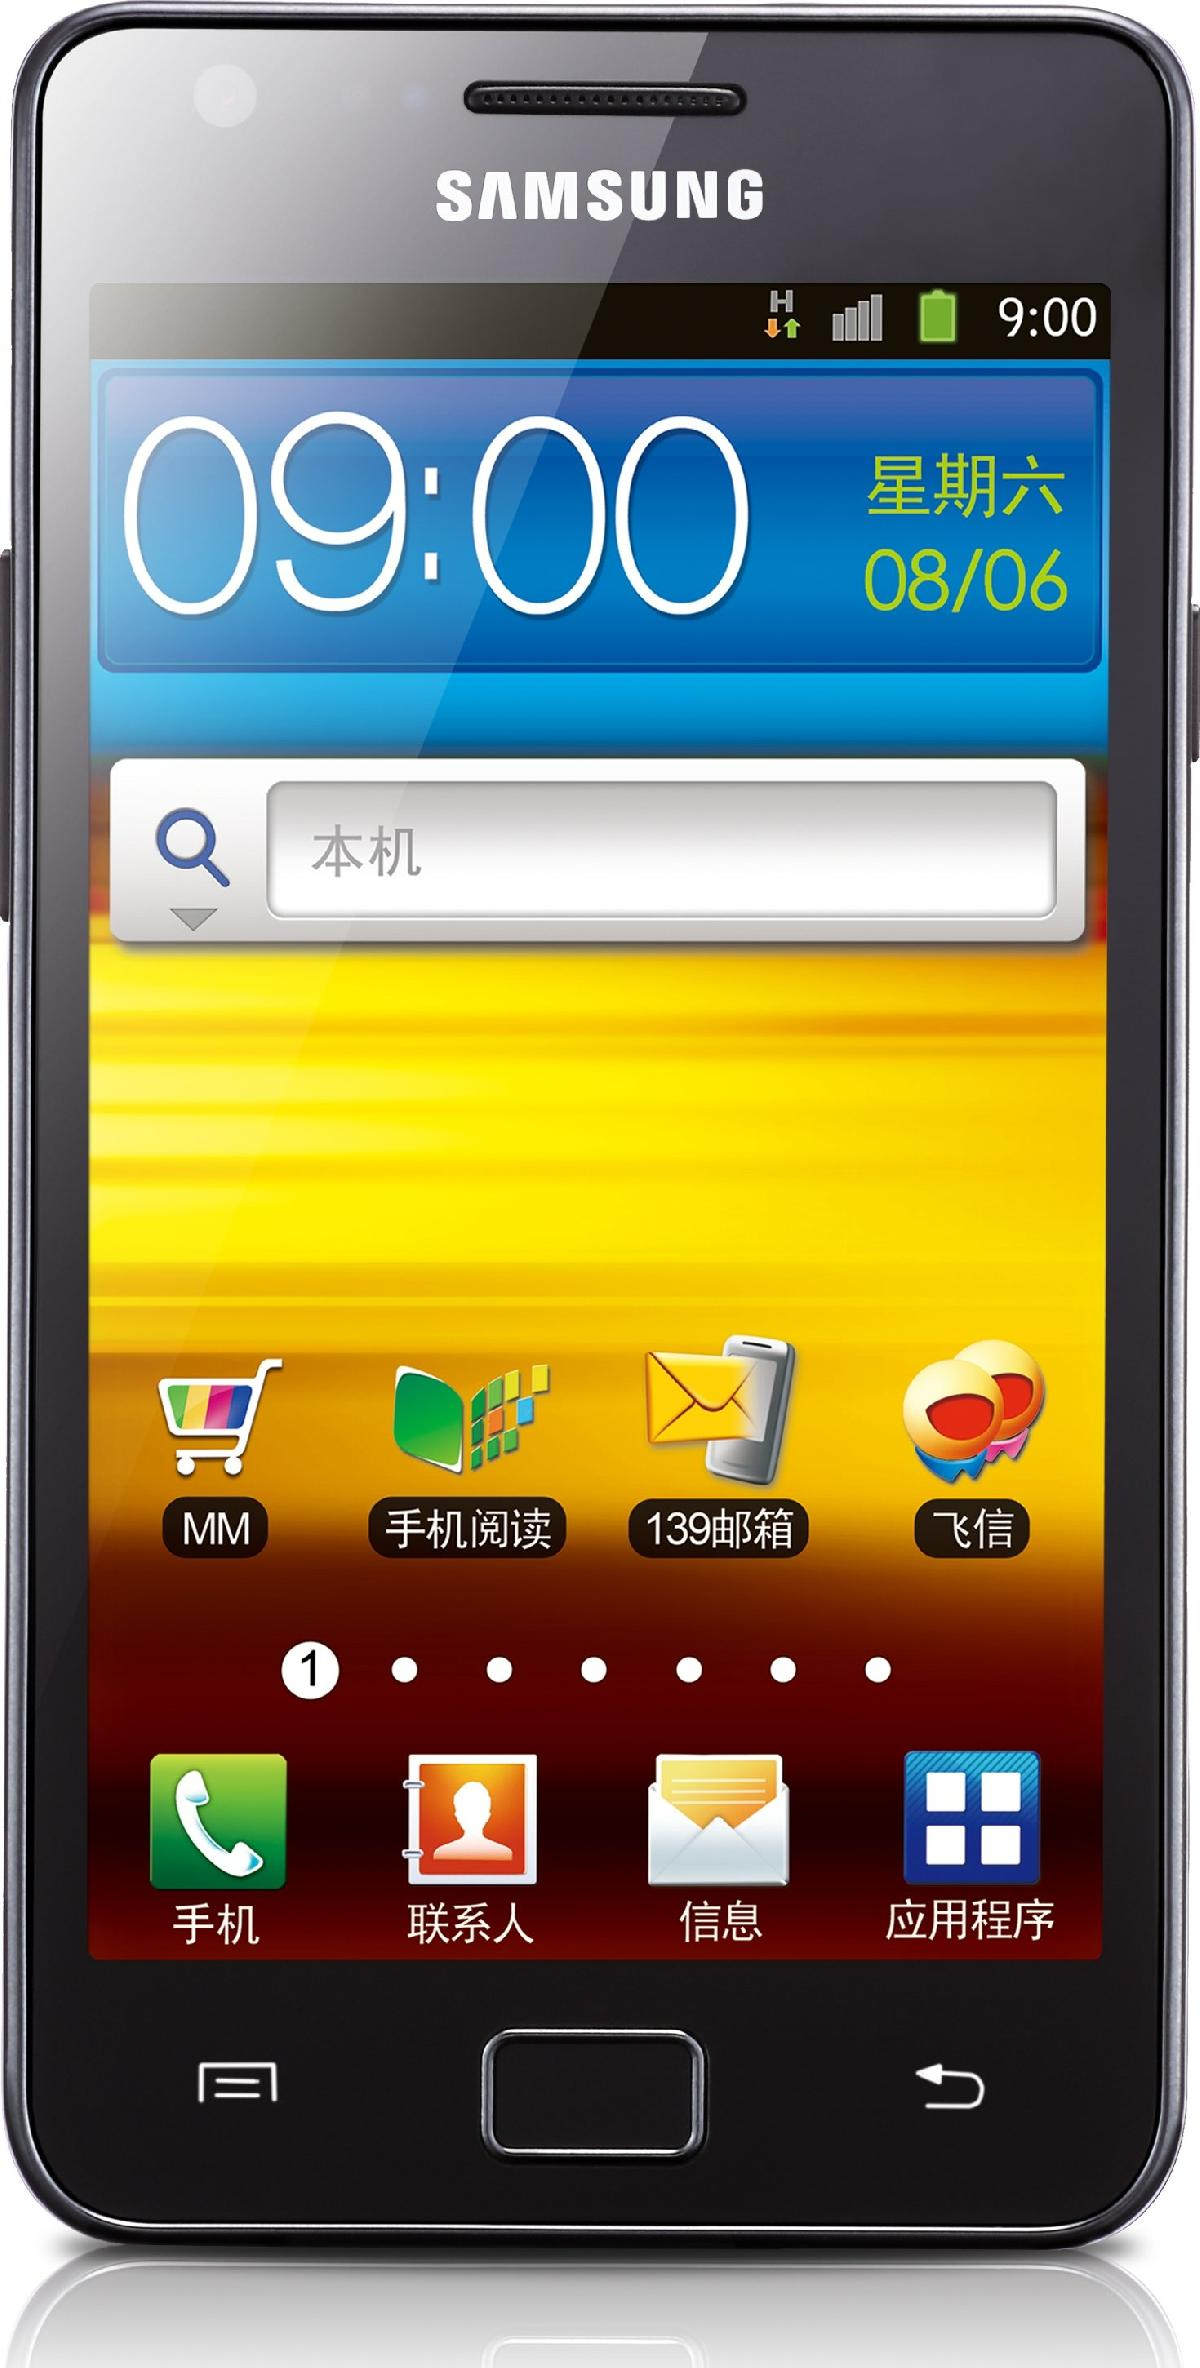 Galaxy S 2 GT-I9108